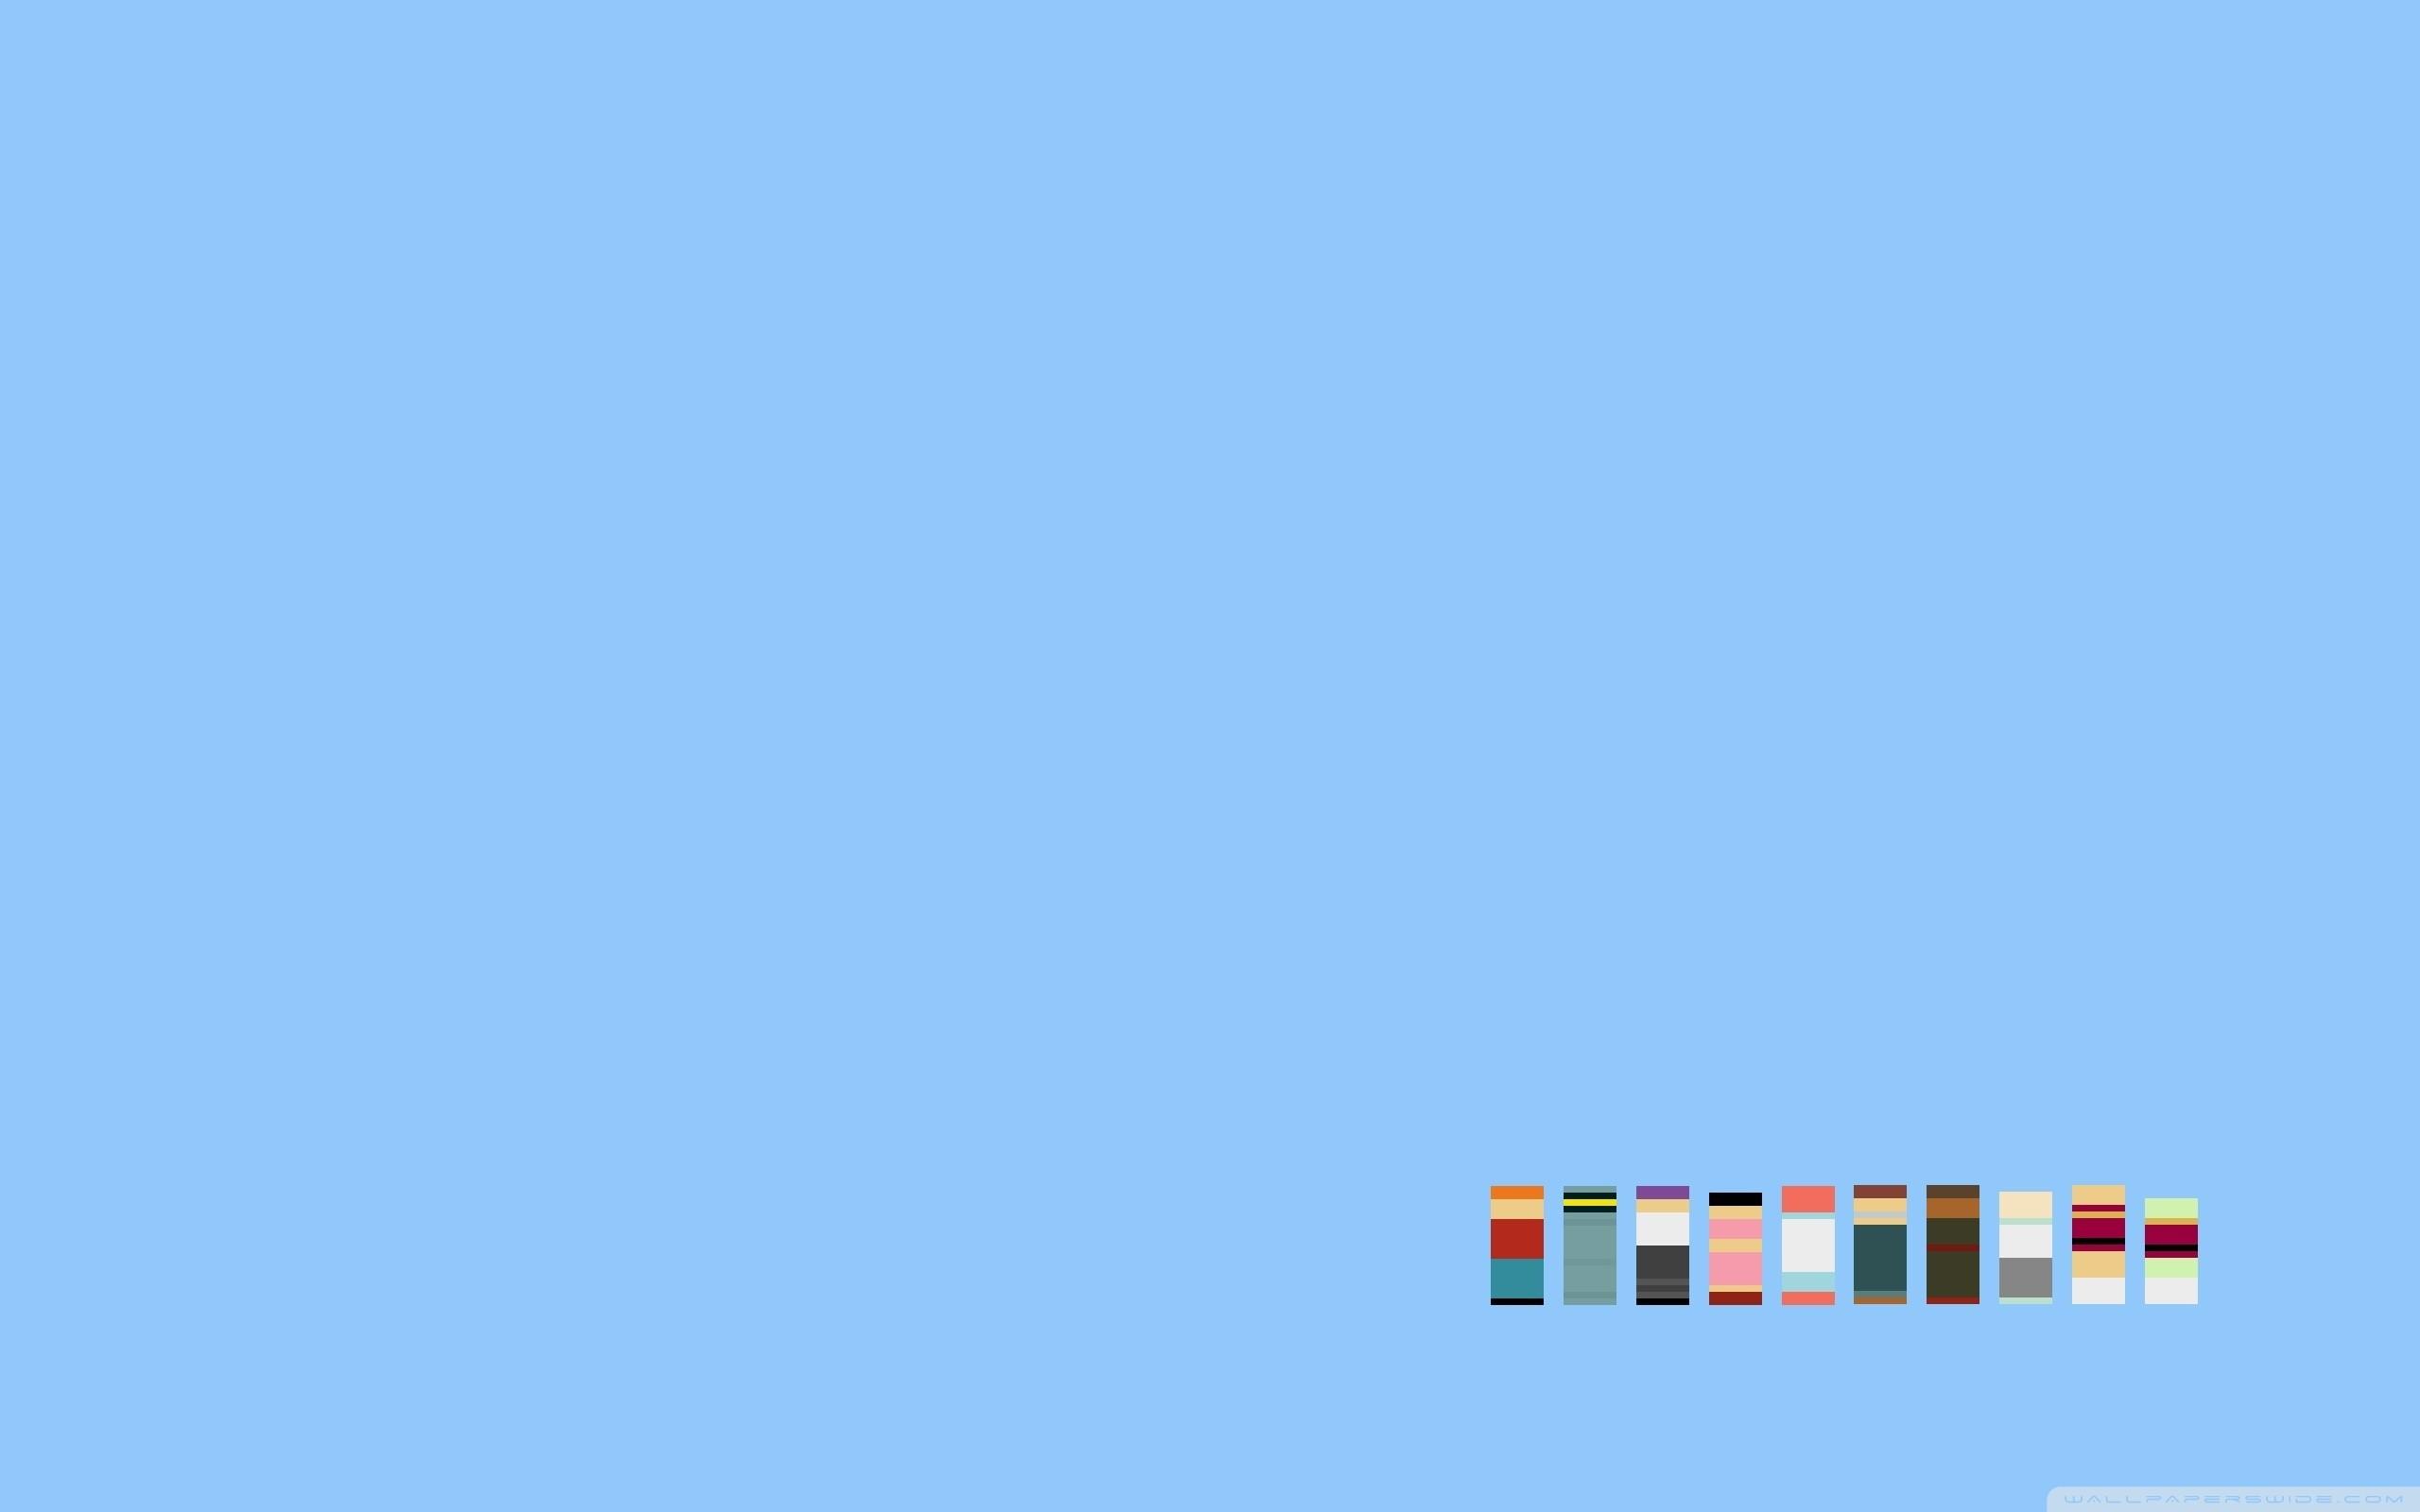 Futurama Minimalism HD Wide Wallpaper for Widescreen